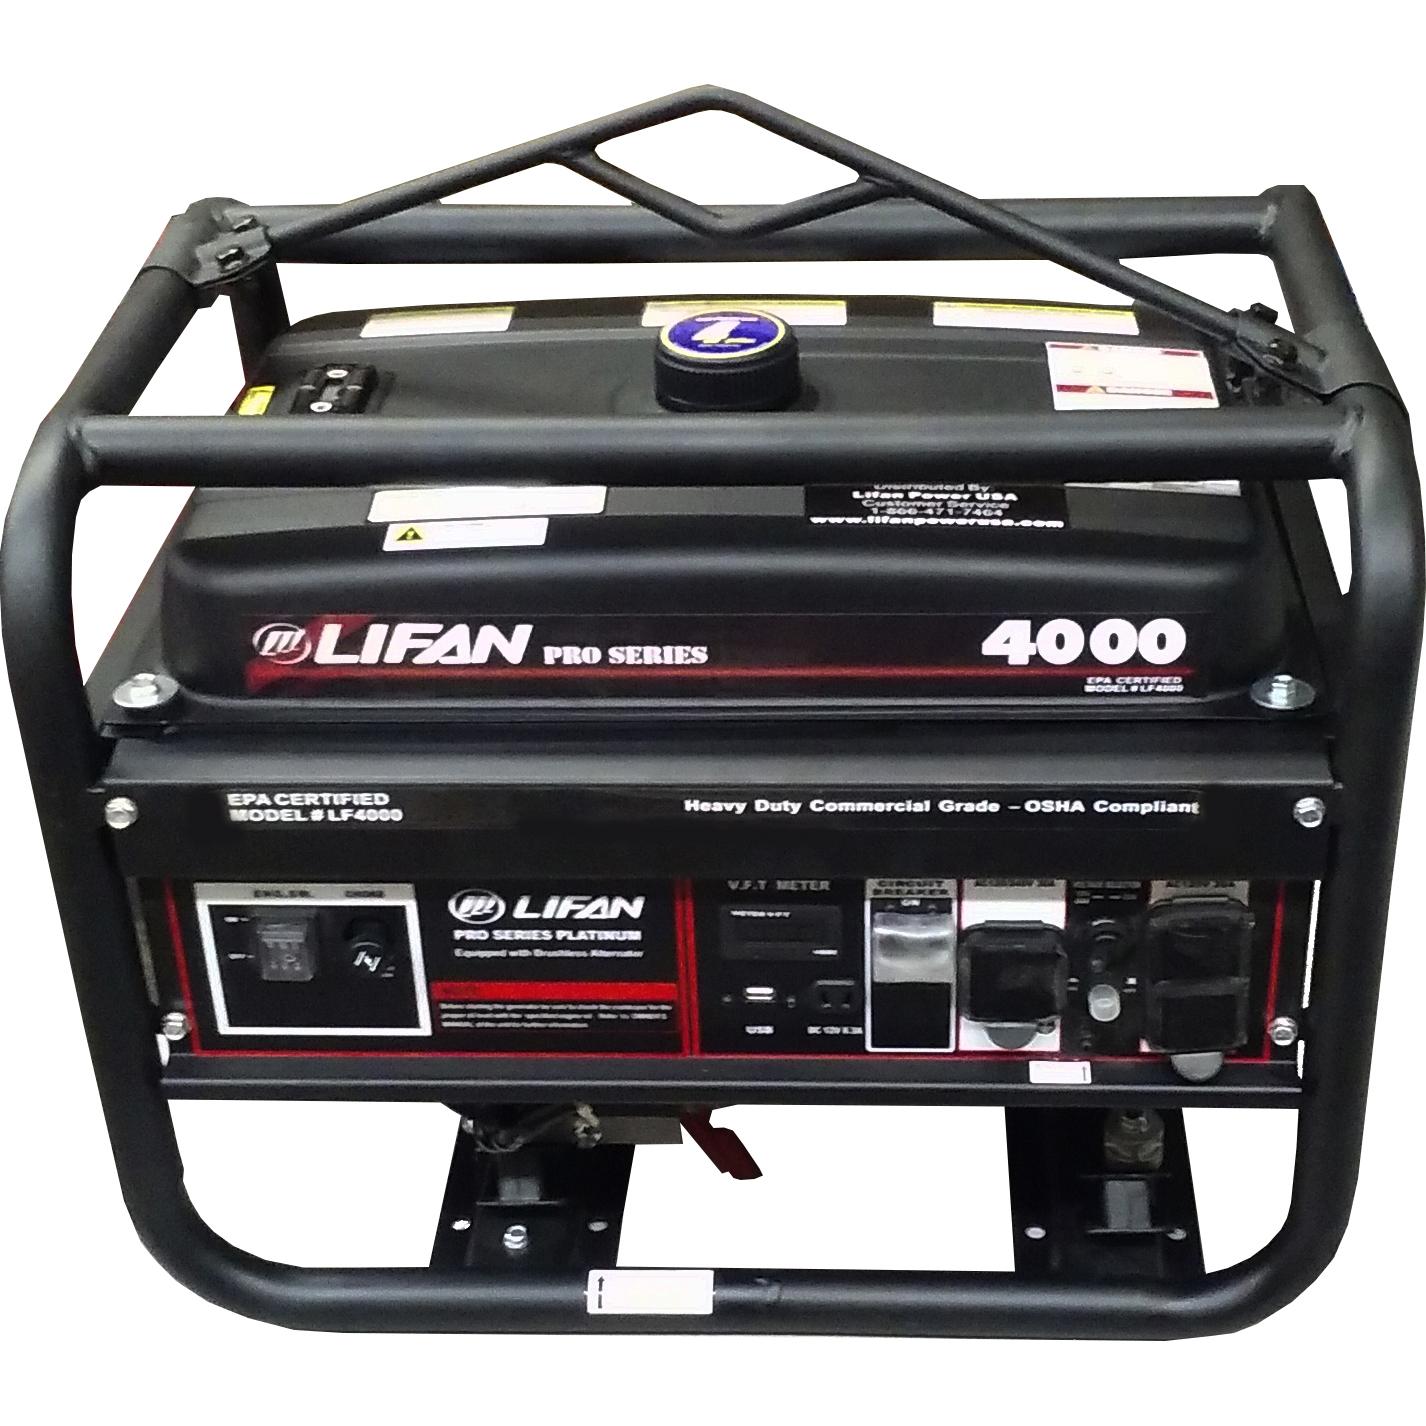 LIFAN LF4000